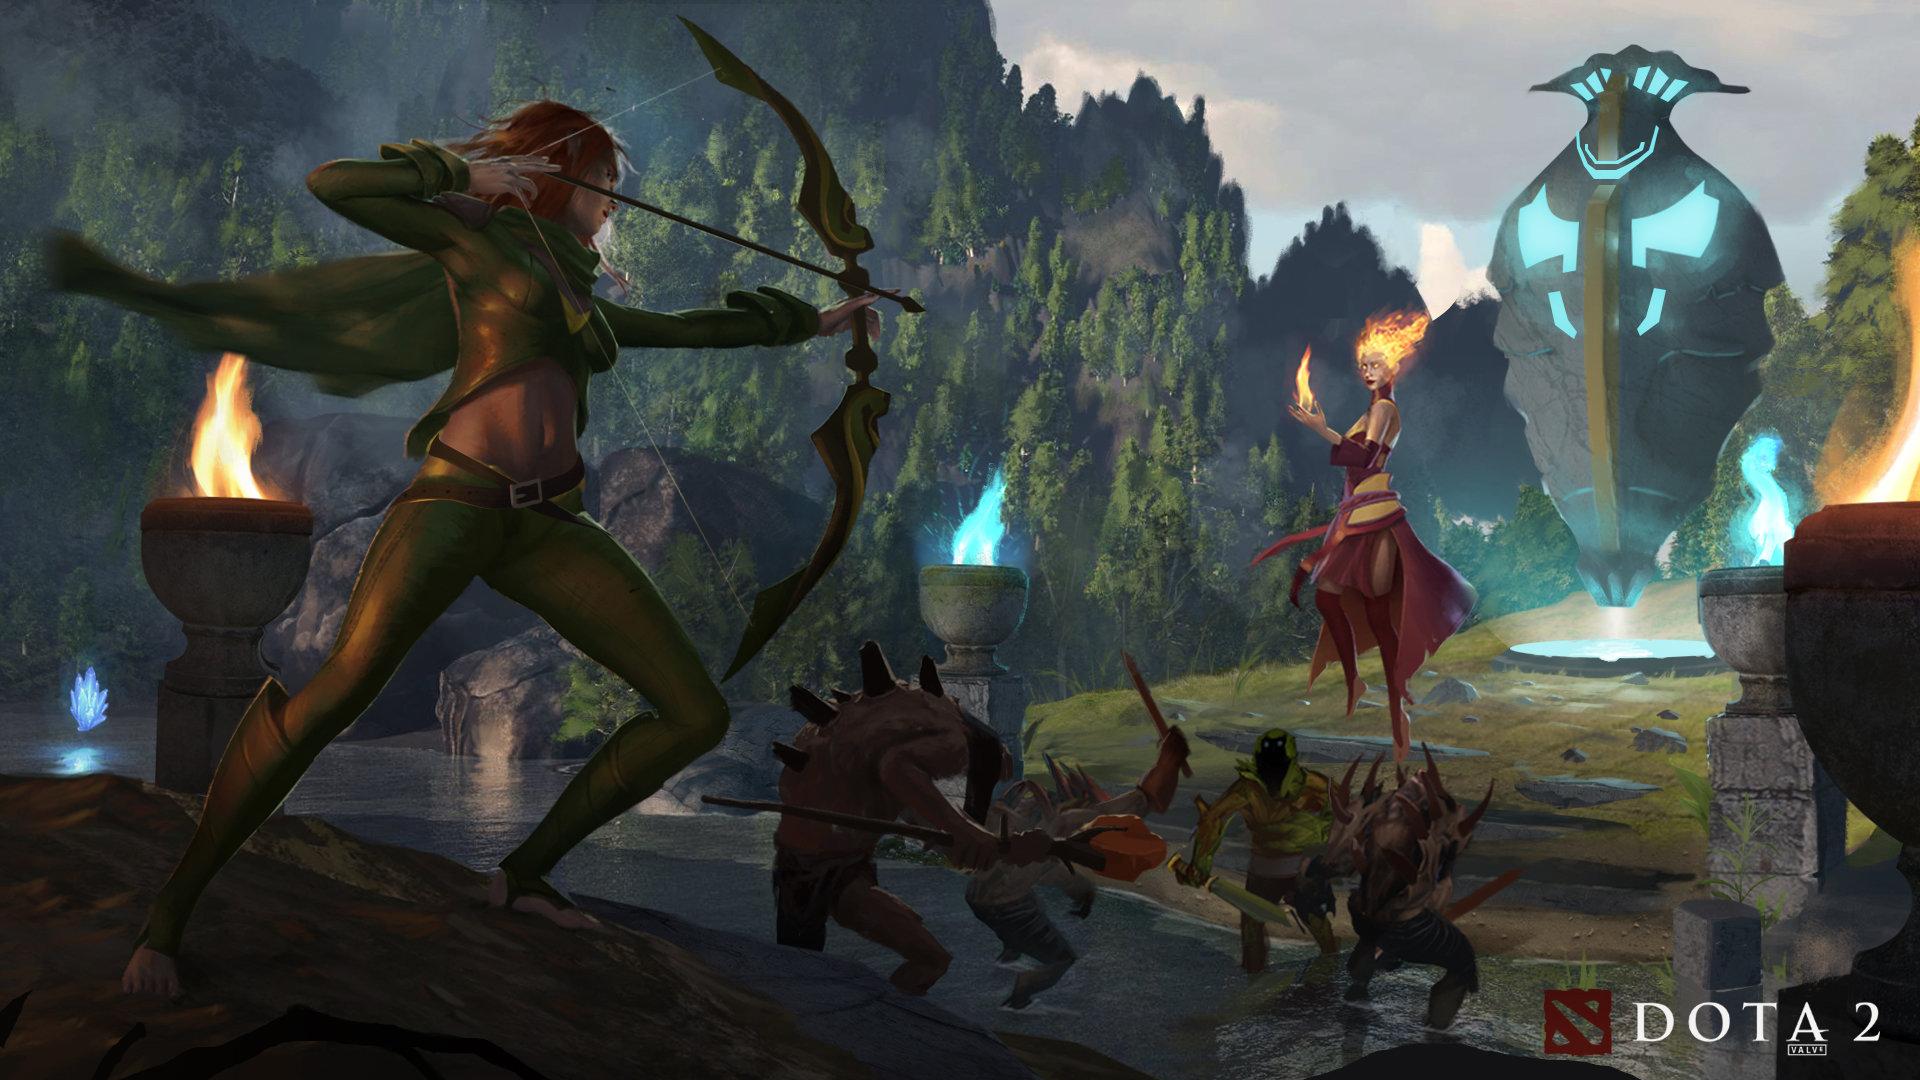 ArtStation - Dota 2: Battle at Mid, Stephen Stark